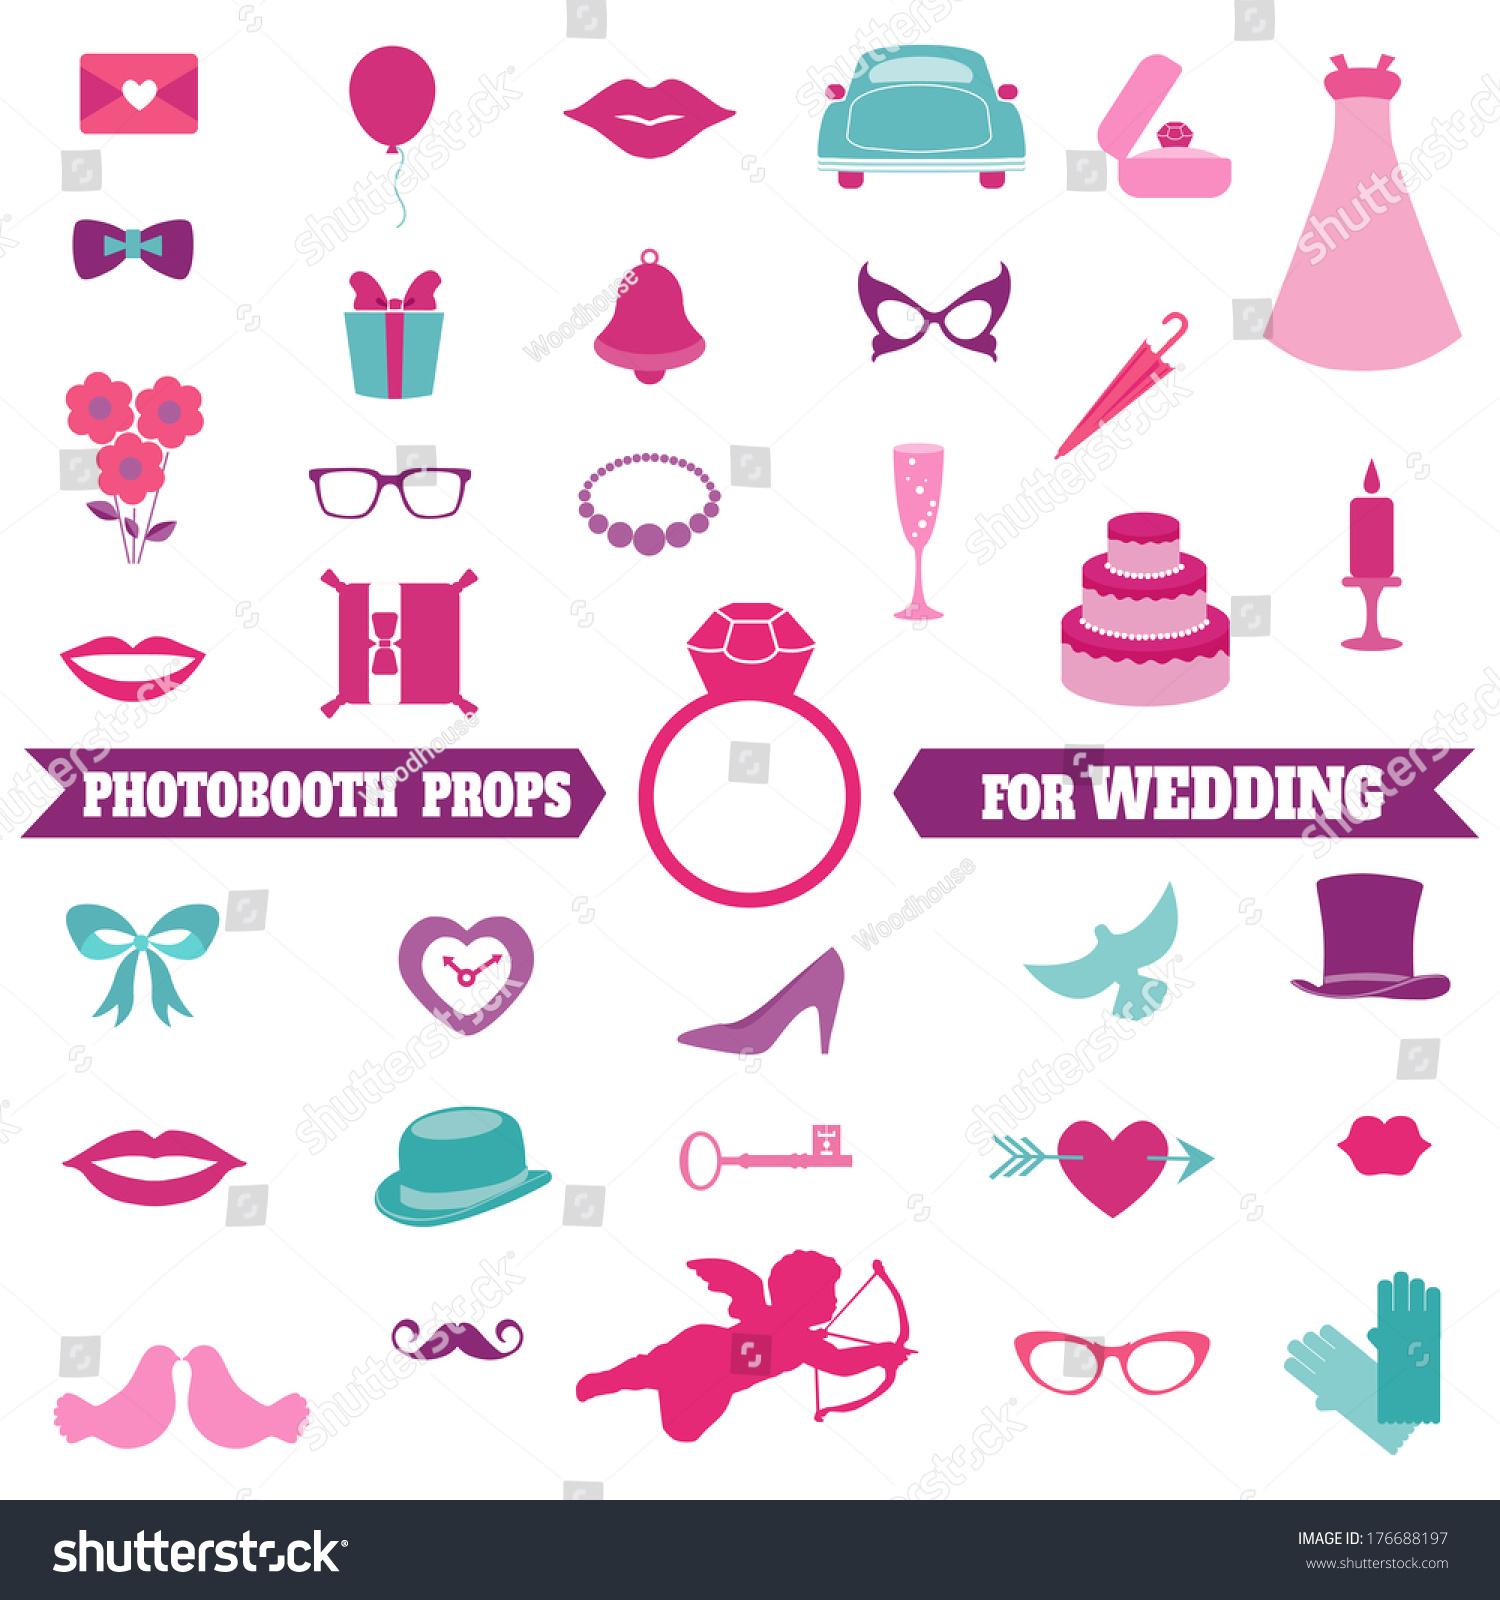 diy photobooth prop wedding photo booth props Wedding Photo Booth Props Bridal Shower Photo Booth Prop Photo Booth Props Instant Download Party Printable Wedding Props